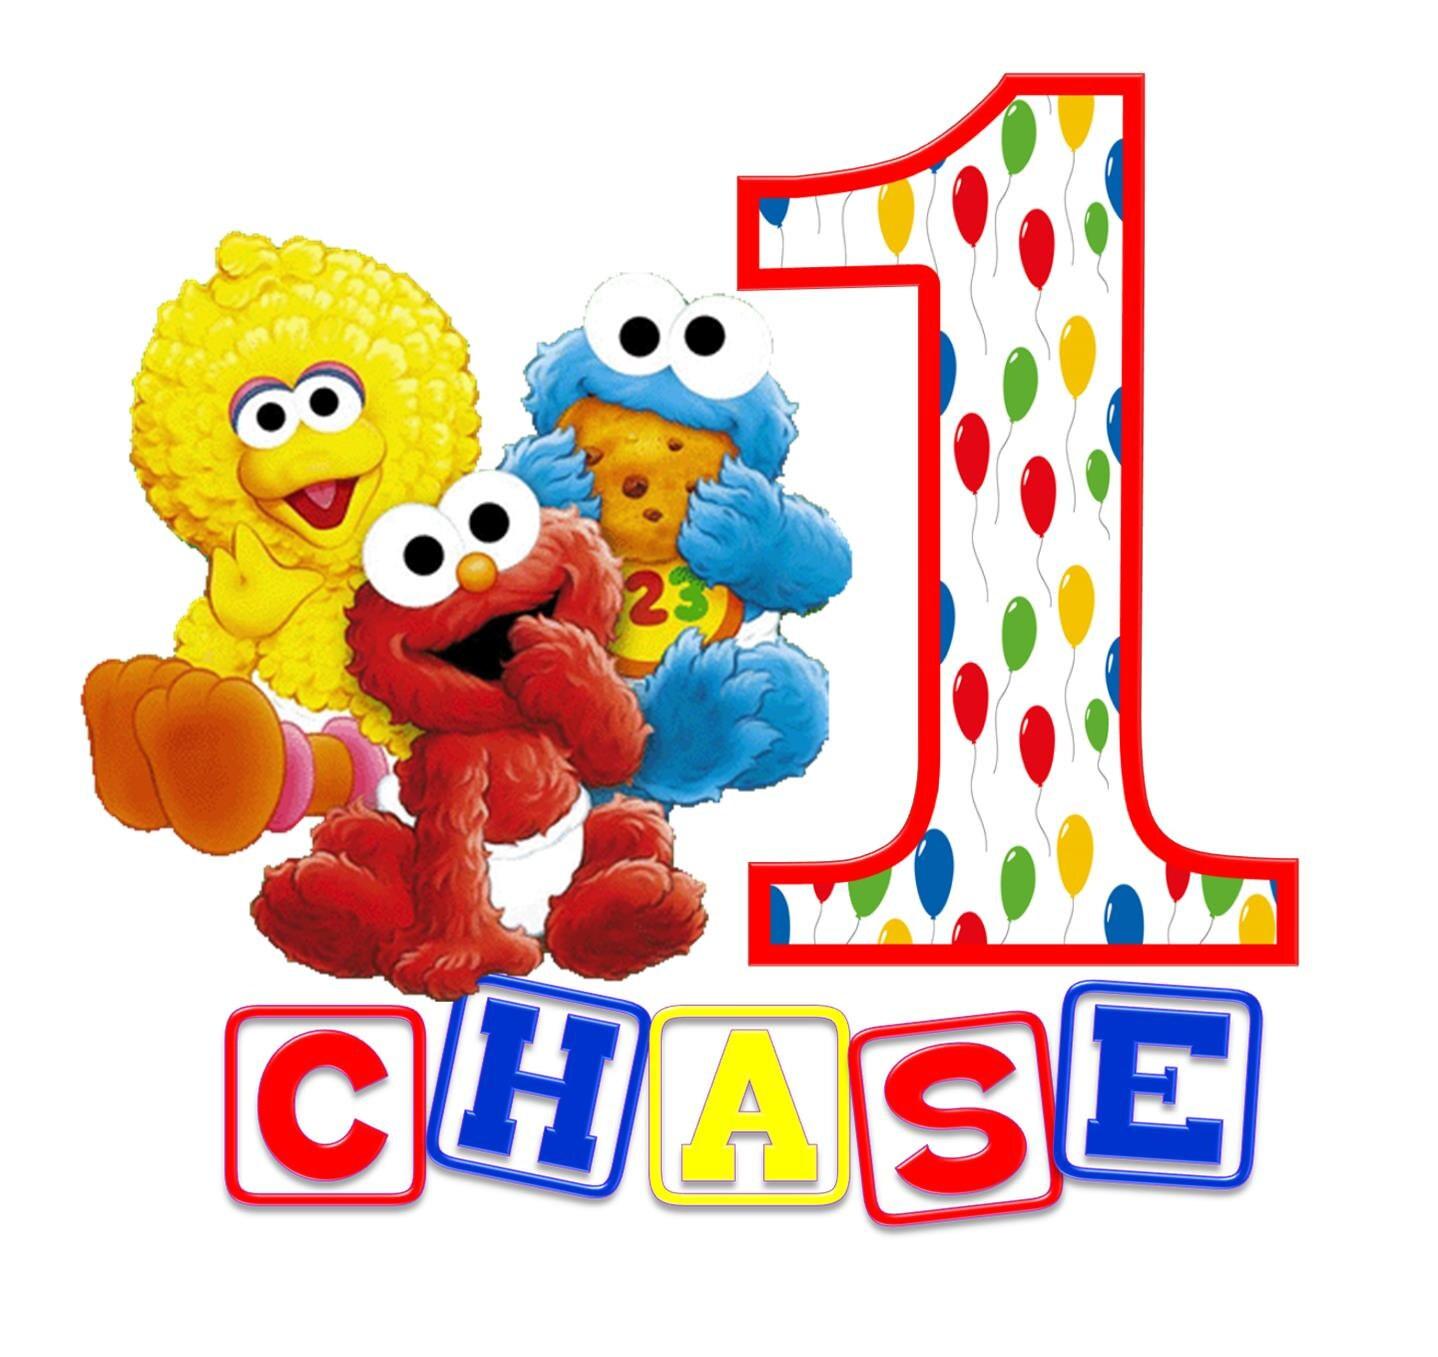 Baby Sesame Street Characters Names Sesame Street Birthday...